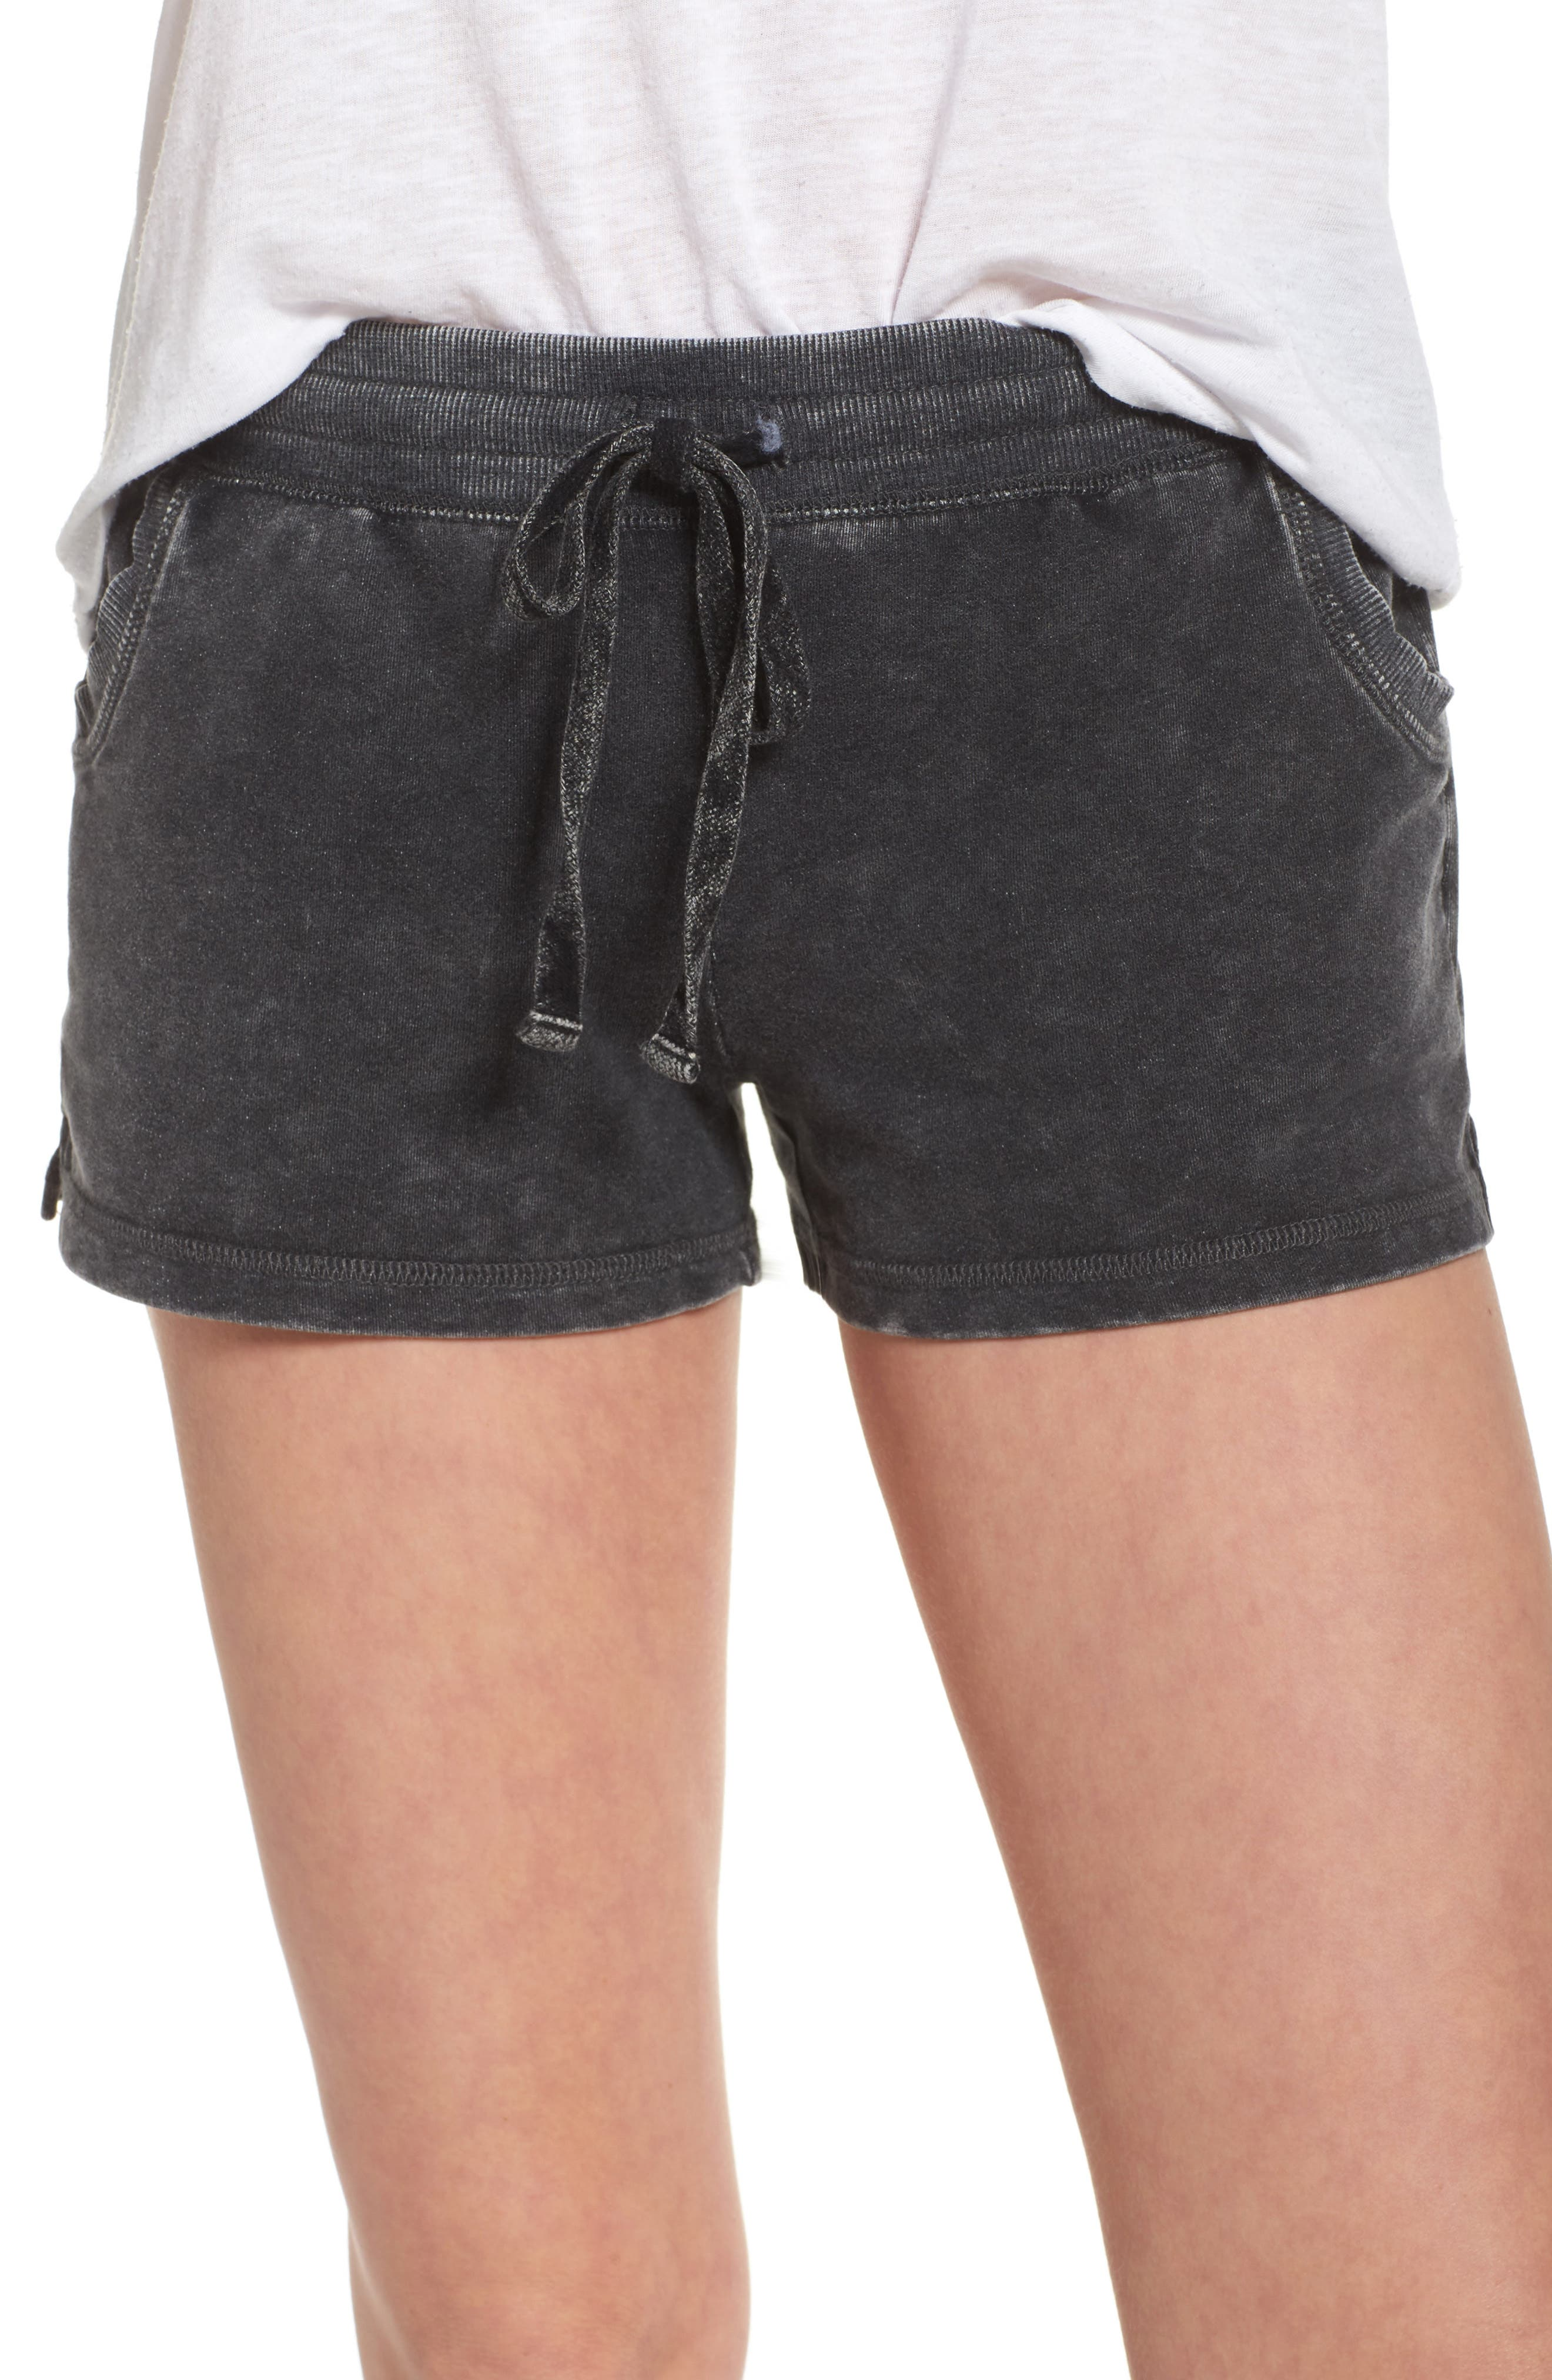 Lounge Shorts,                             Main thumbnail 1, color,                             Black